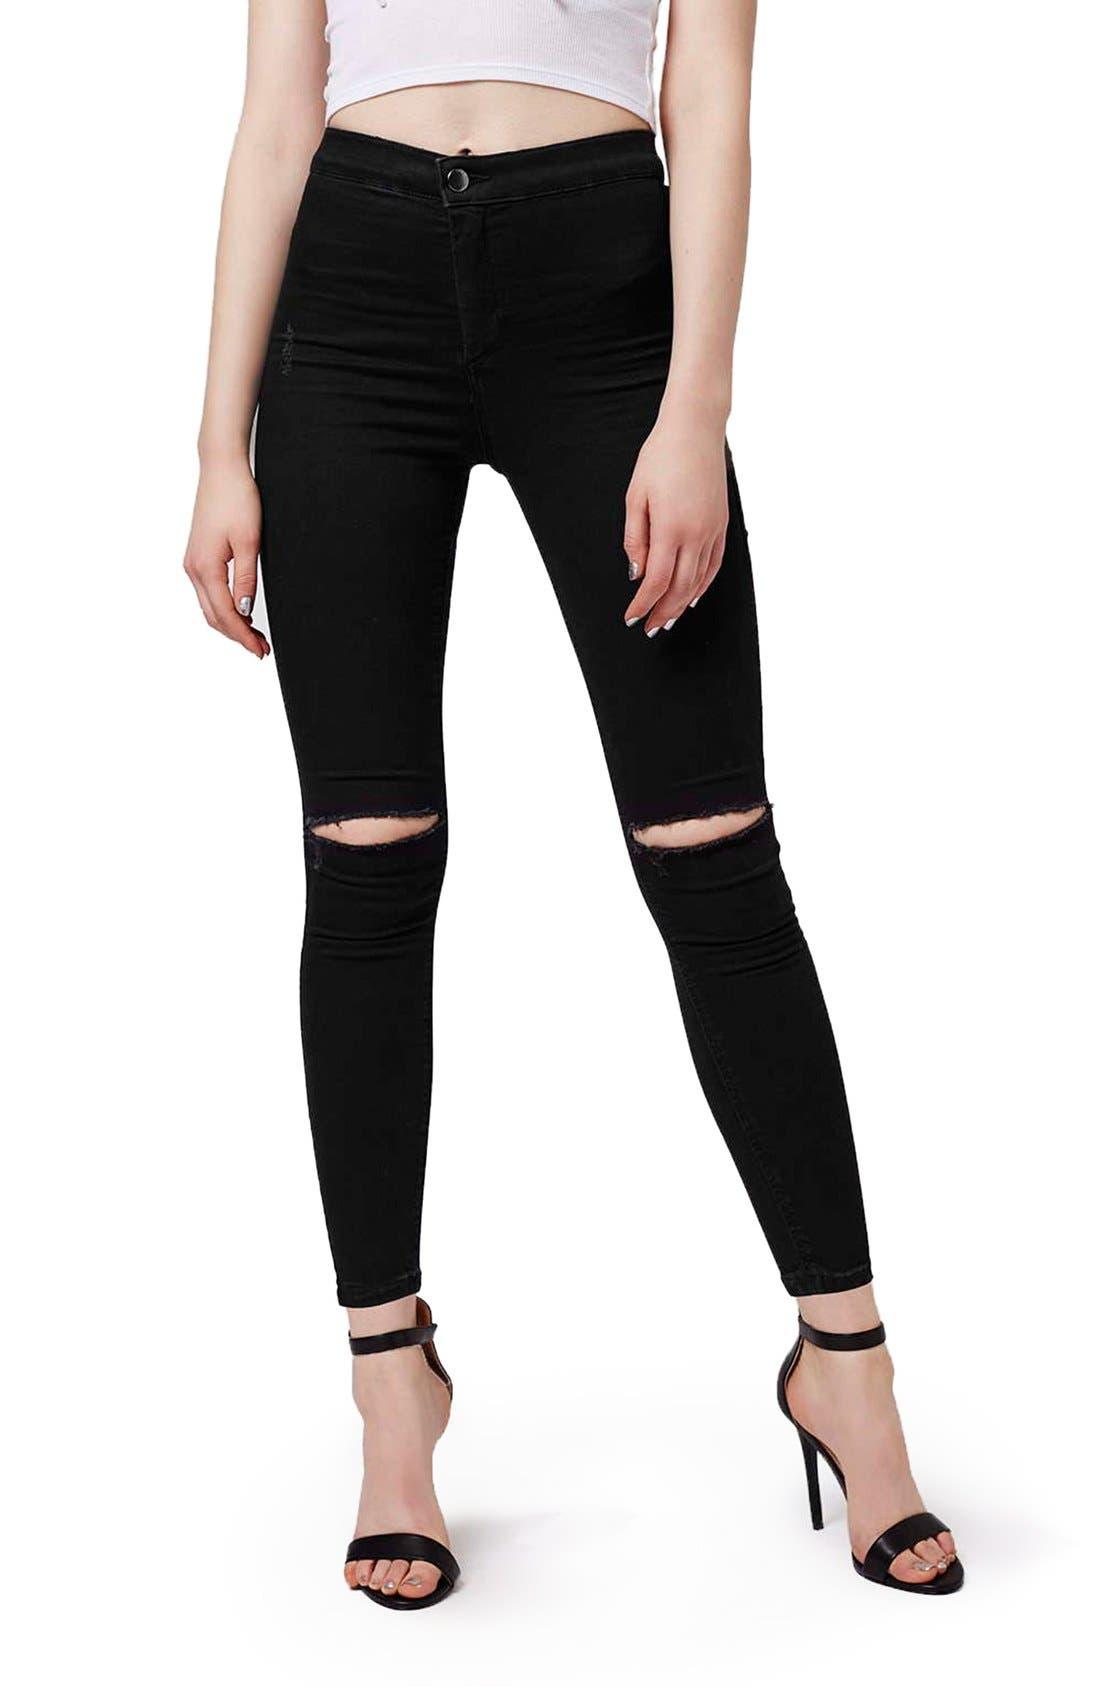 Main Image - Topshop Moto 'Joni' Ripped Skinny Jeans (Petite)